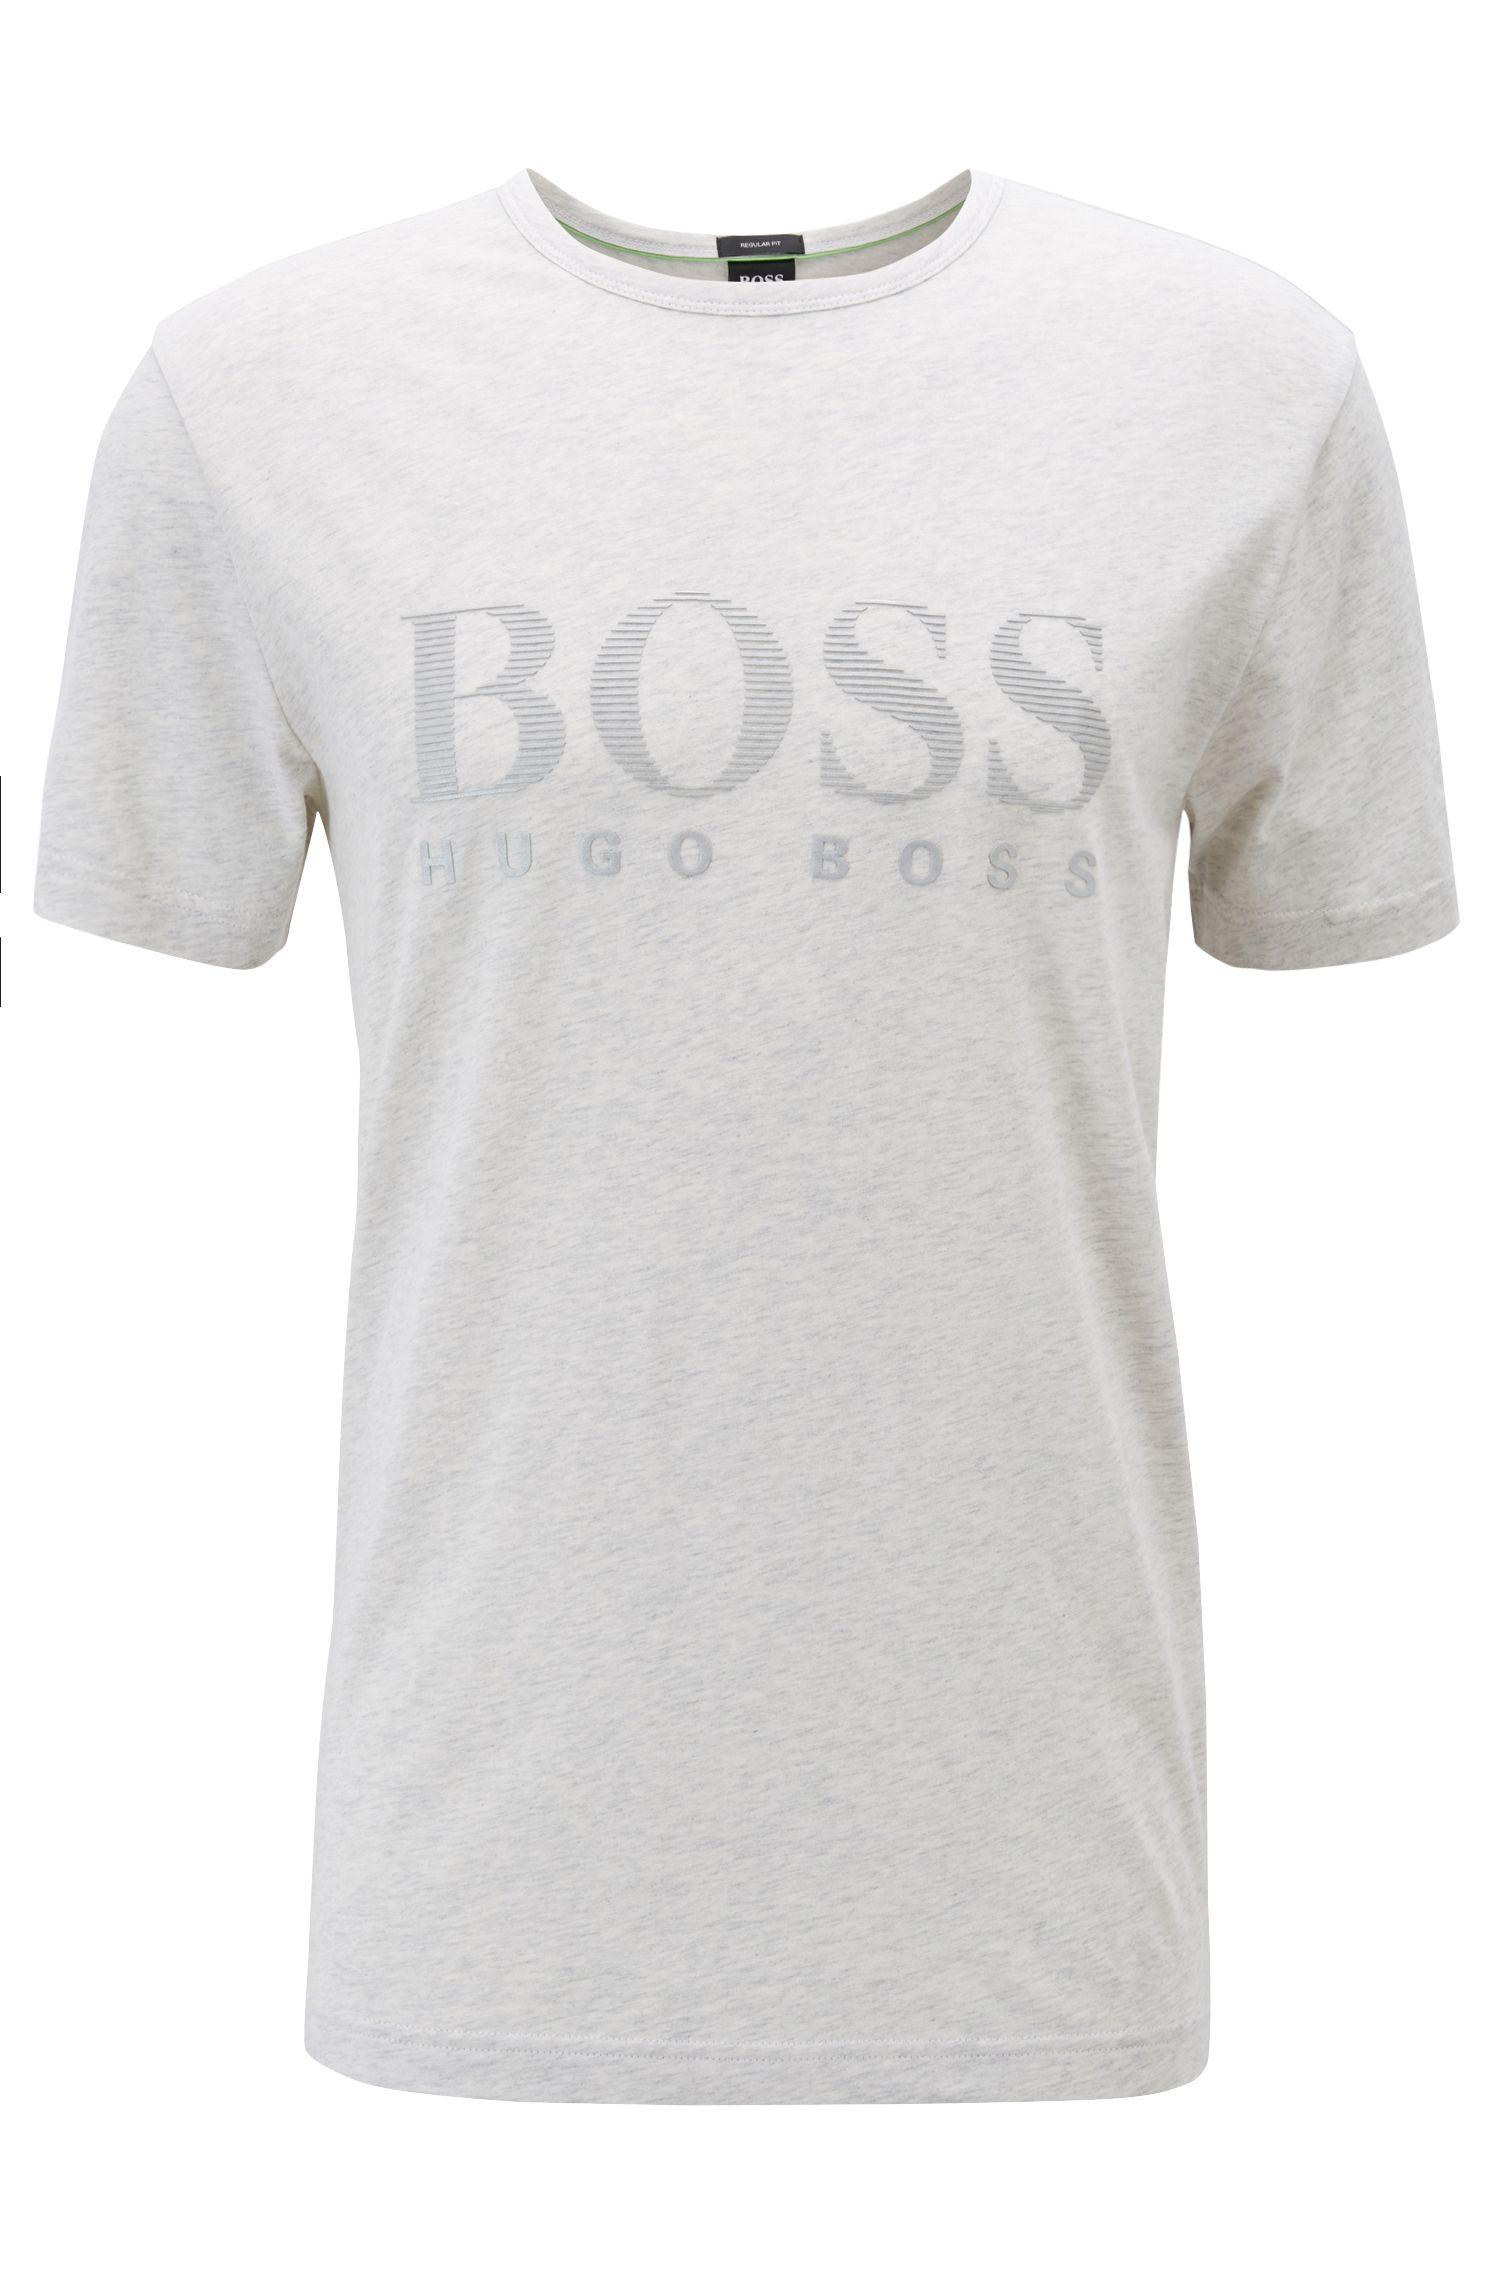 T-Shirt aus Baumwolle mit tonalem Logo-Print, Hellgrau